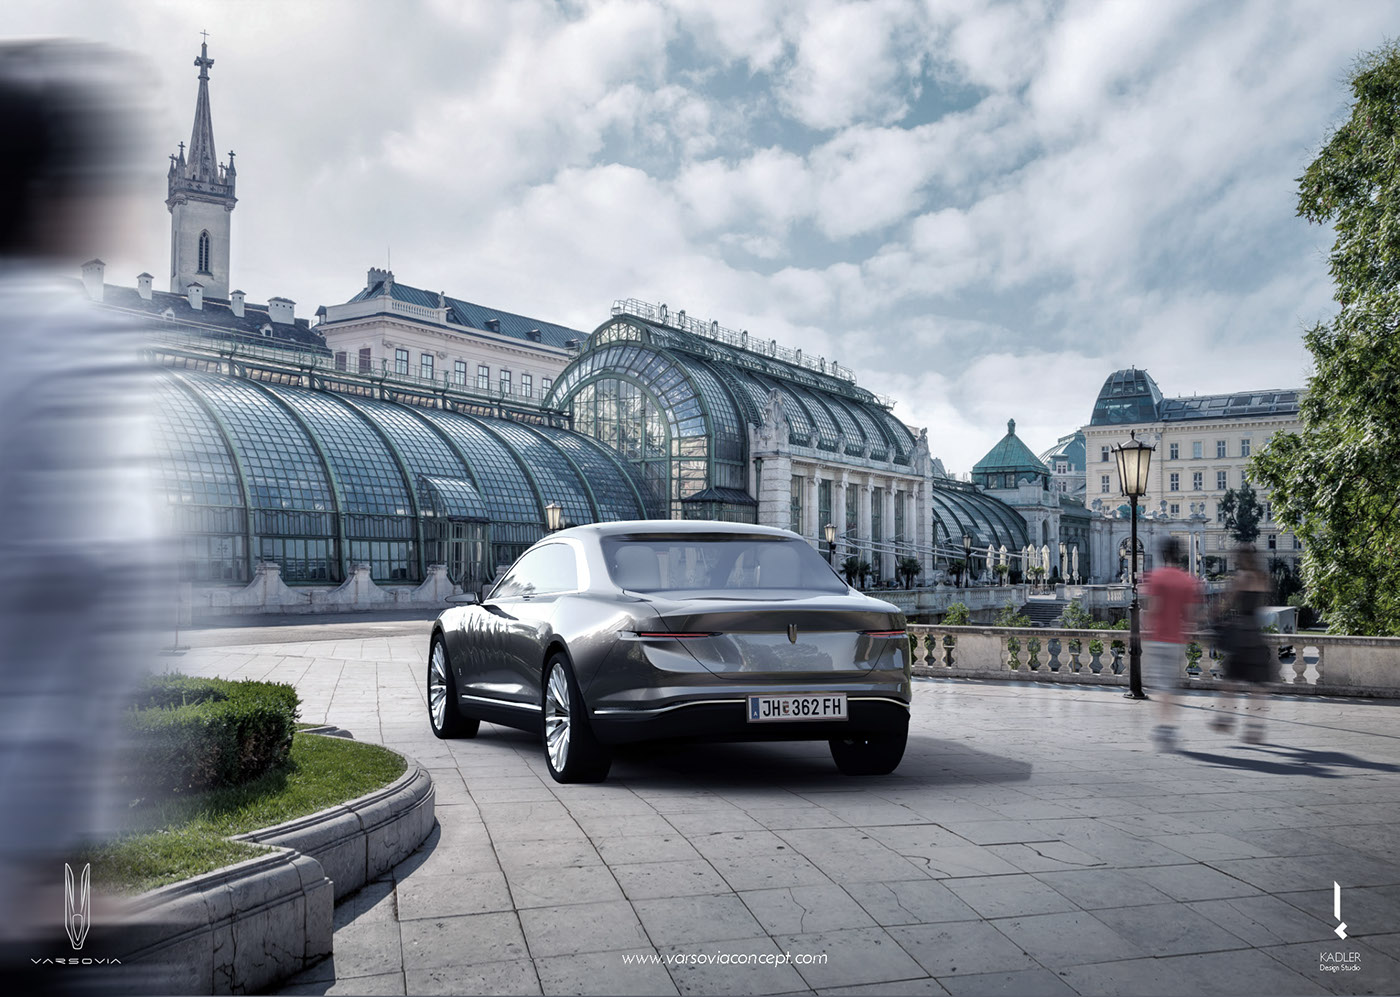 varsovia concept motor company car design Automotive design Transportation Design concept car rendering